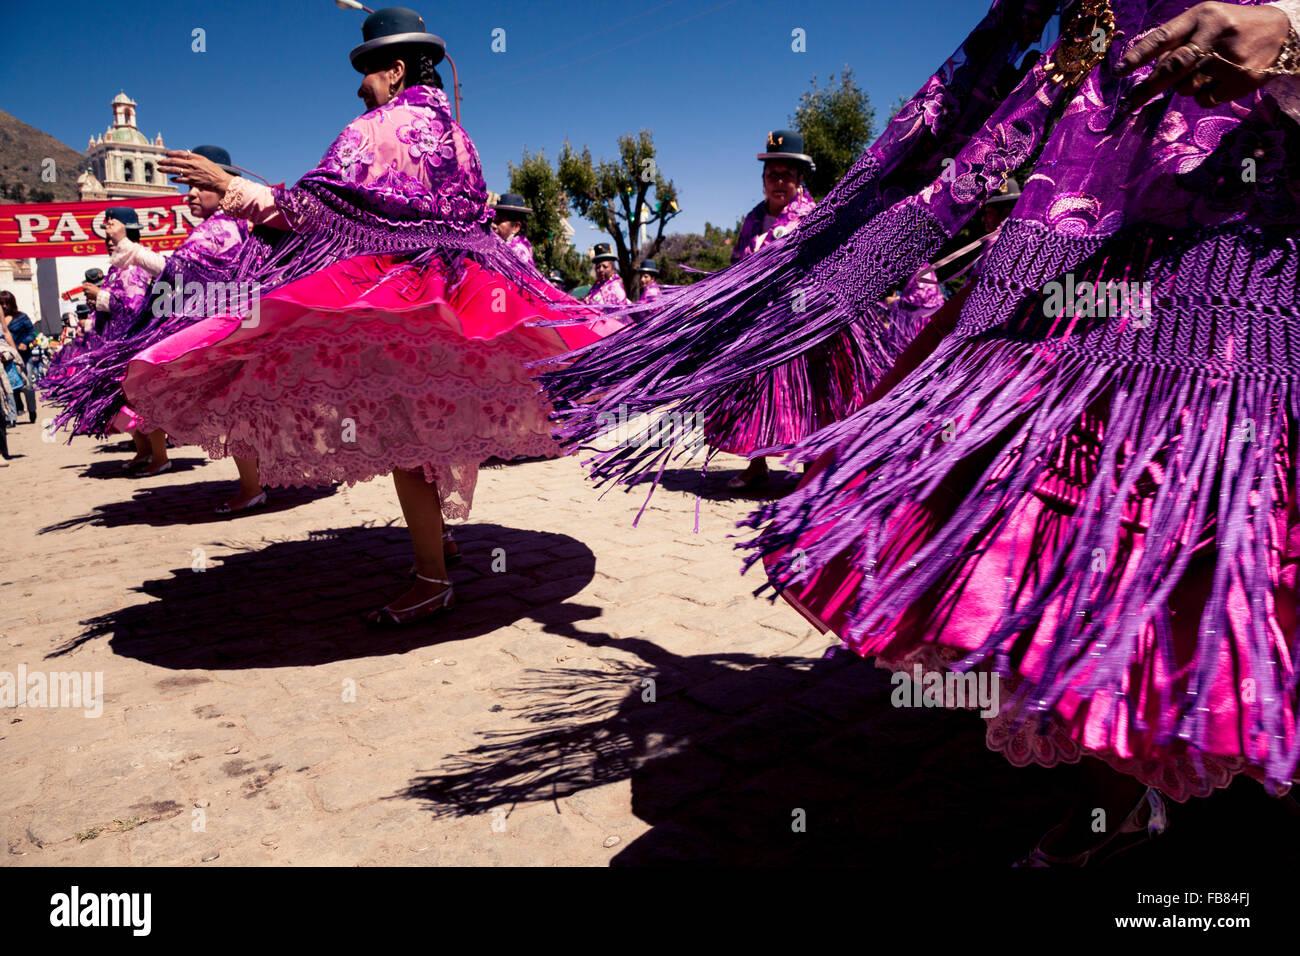 Dancing in the street during the Fiesta del Señor de la Cruz de Colquepata in Copacabana, Bolivia. - Stock Image